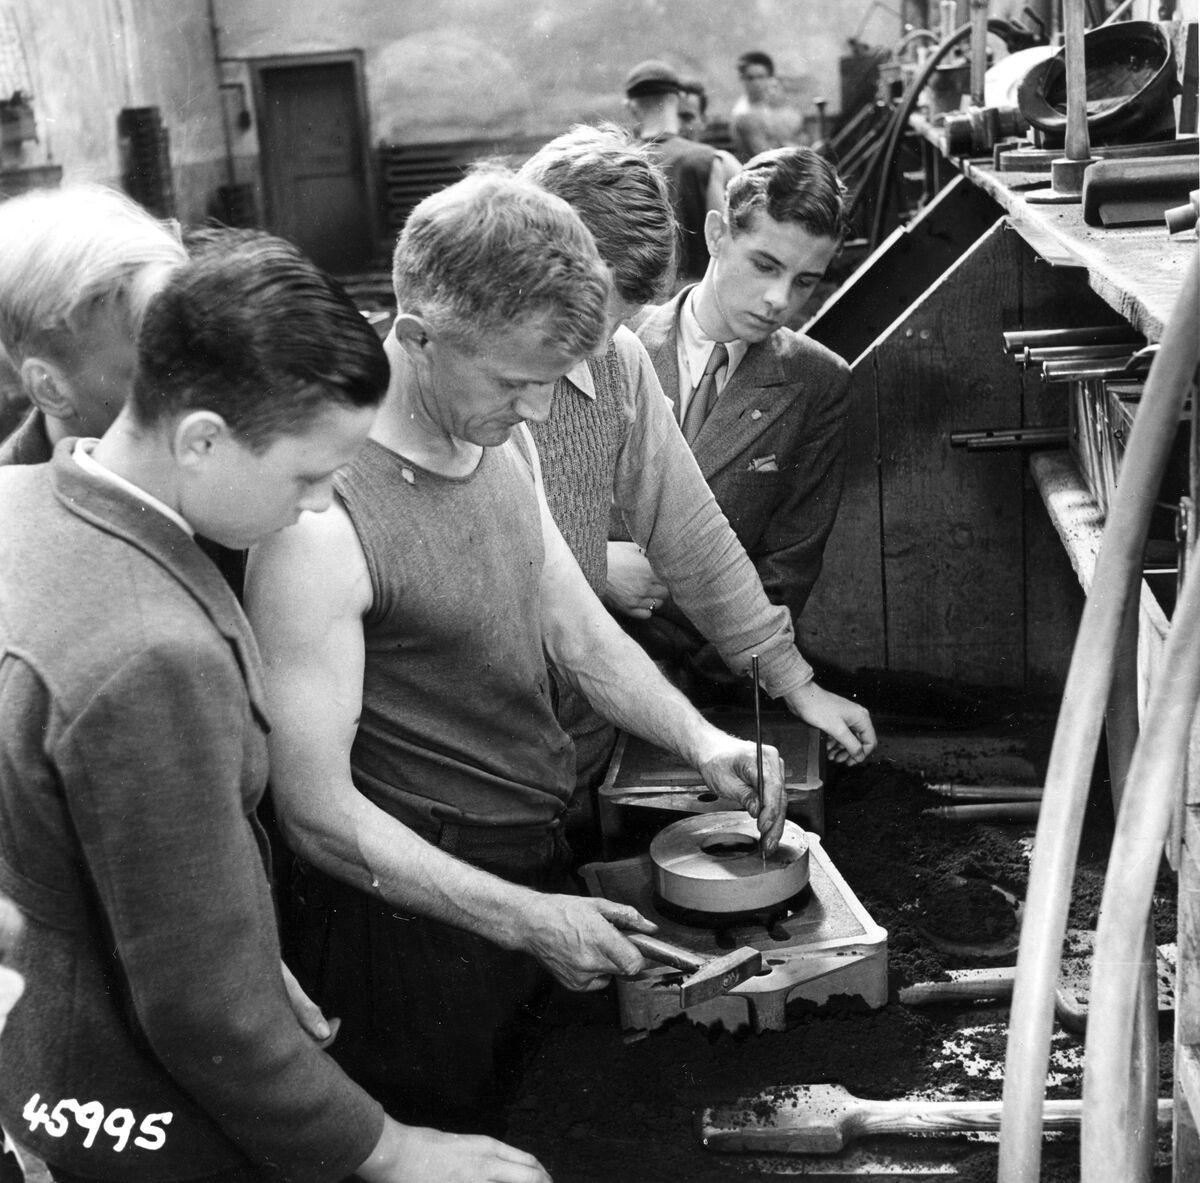 GFA 12/45995: Reportage casting process in malleable casting